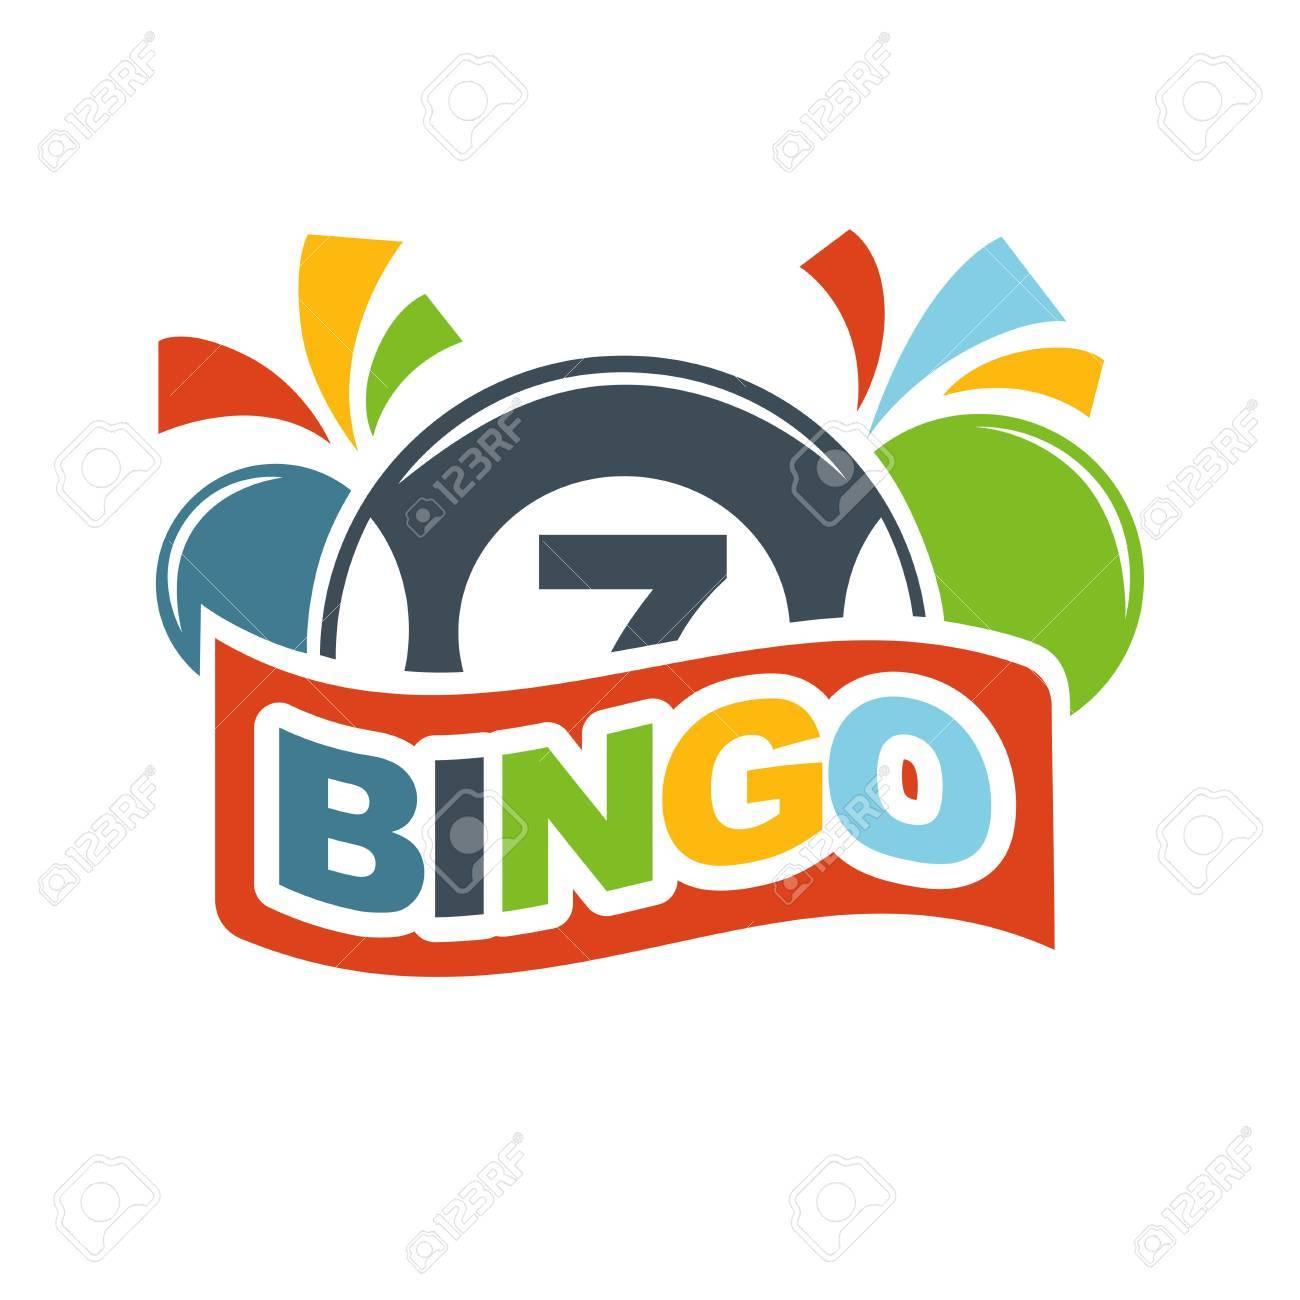 bingo lotto lottery logo template winner lucky numbers on balls rh 123rf com